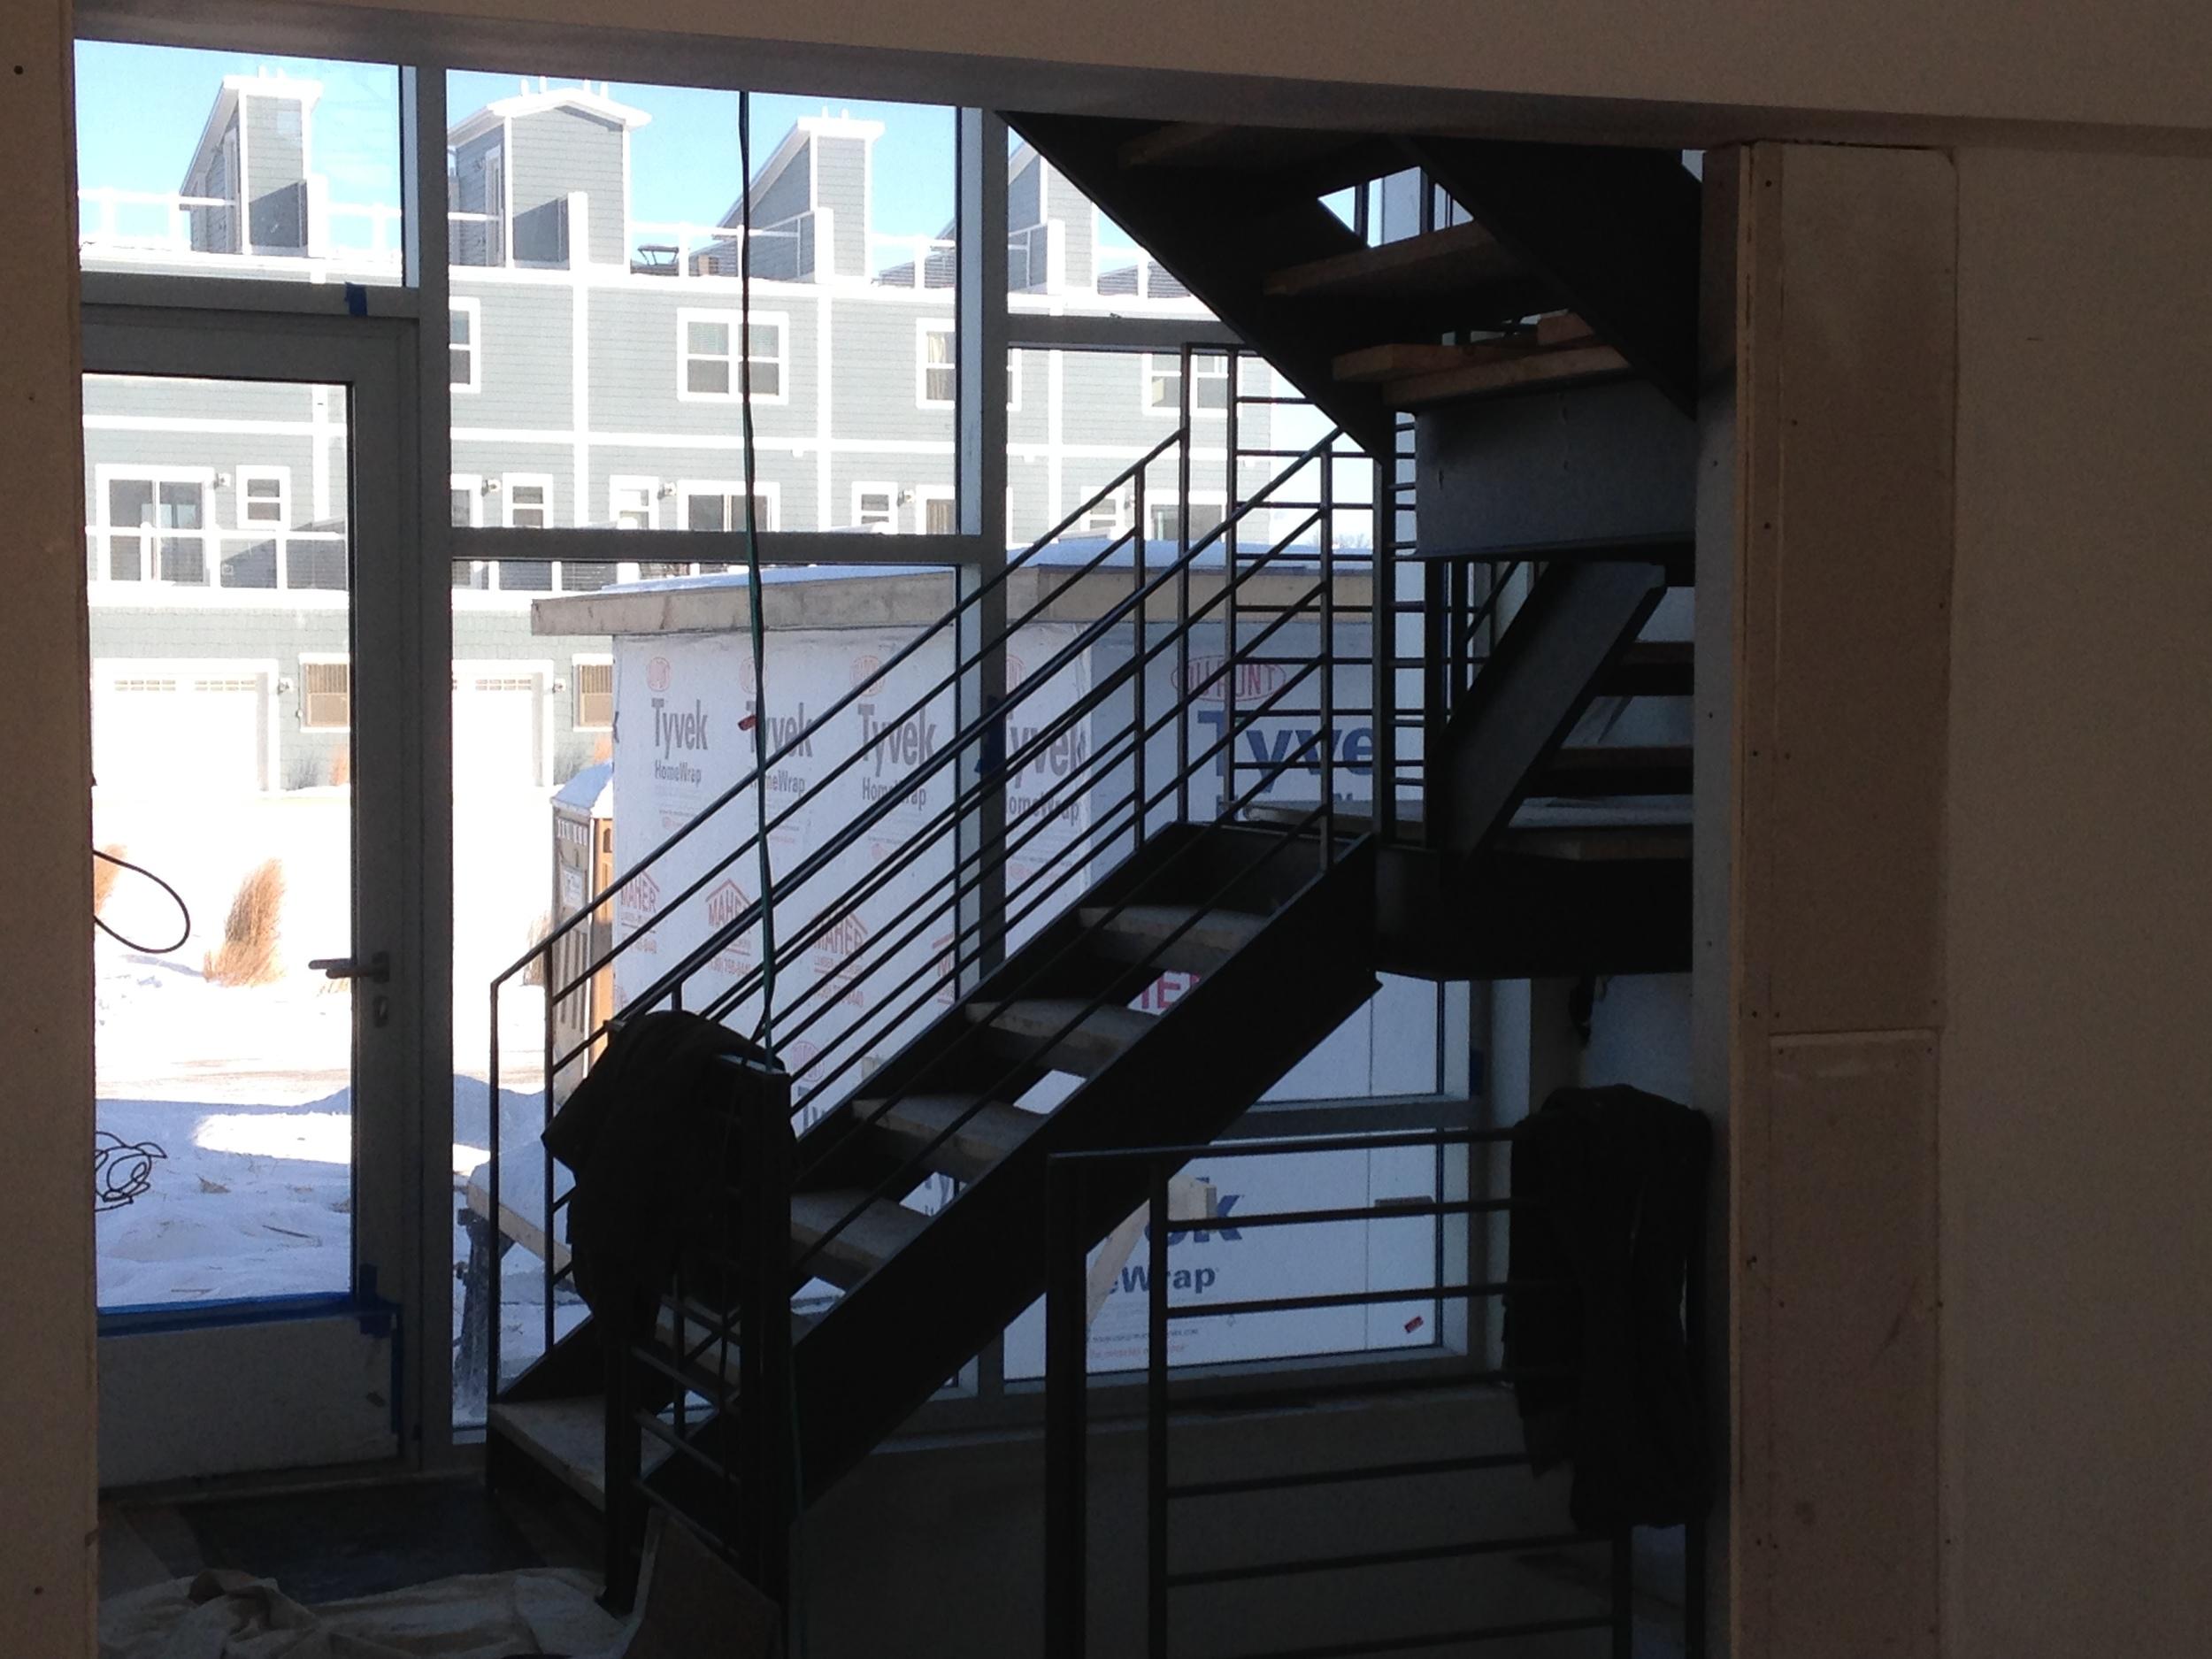 Stair hall entry looking toward street